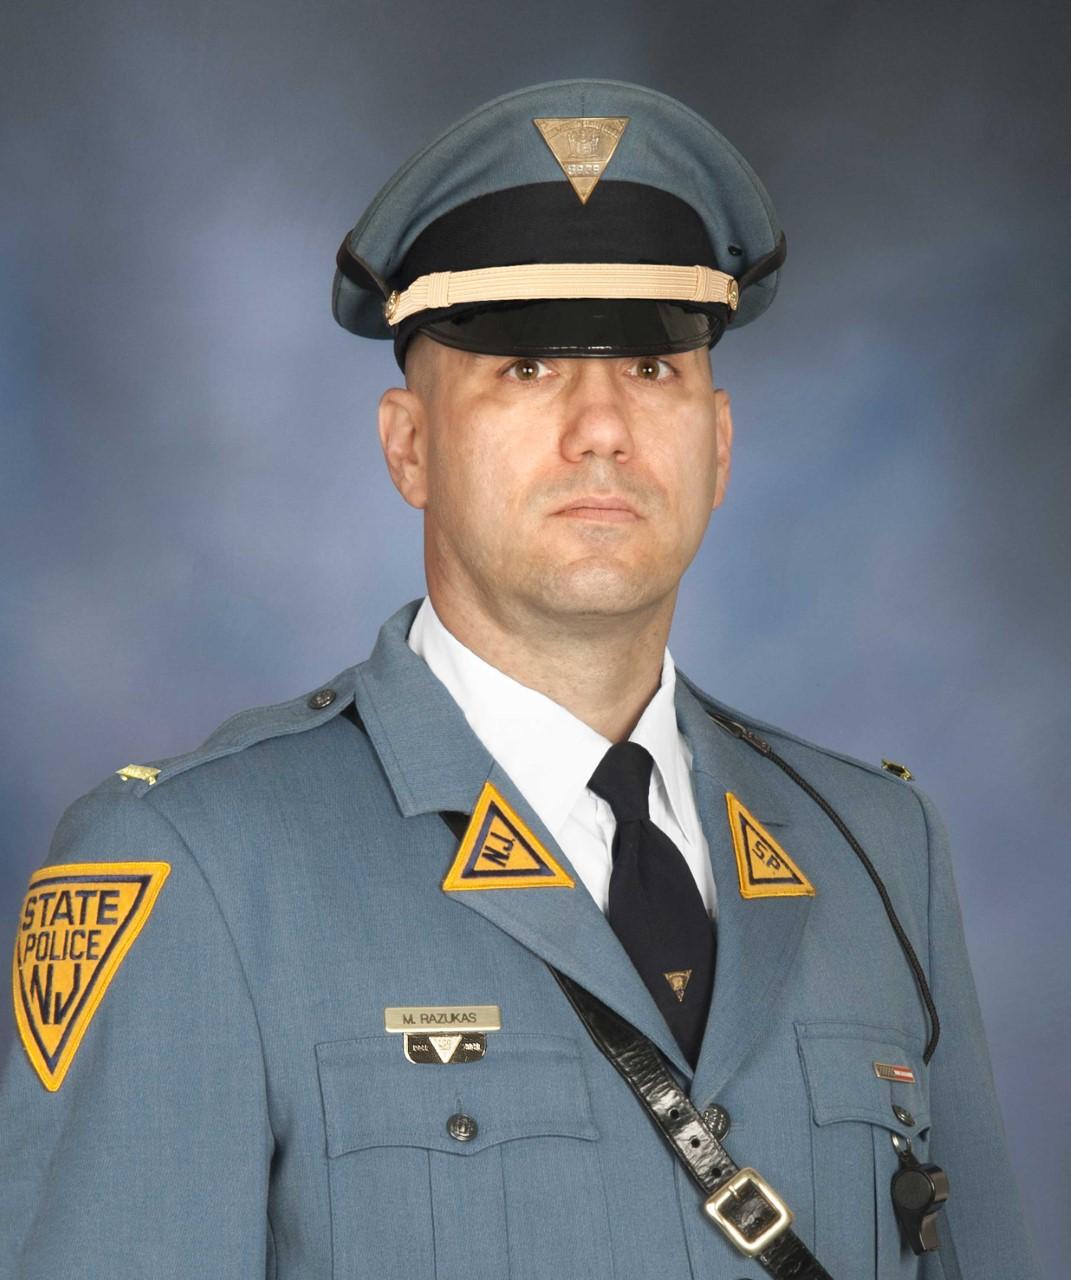 Lieutenant Matthew D. Razukas   New Jersey State Police, New Jersey